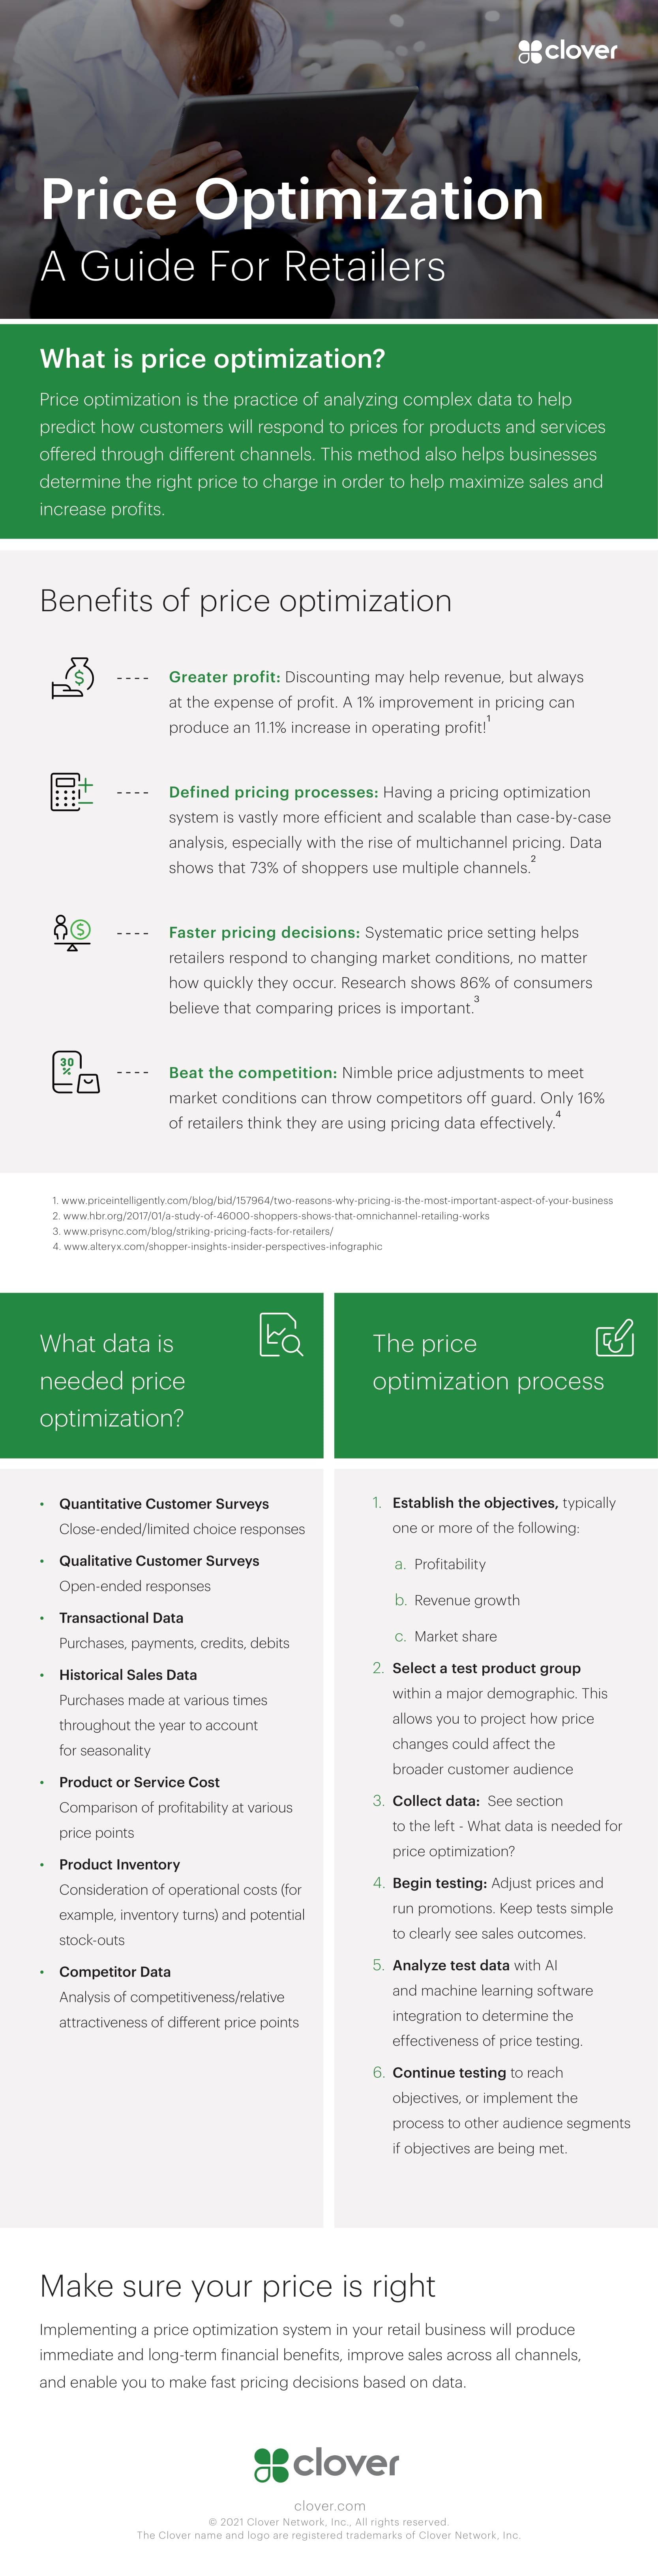 Price Optimization Infographic